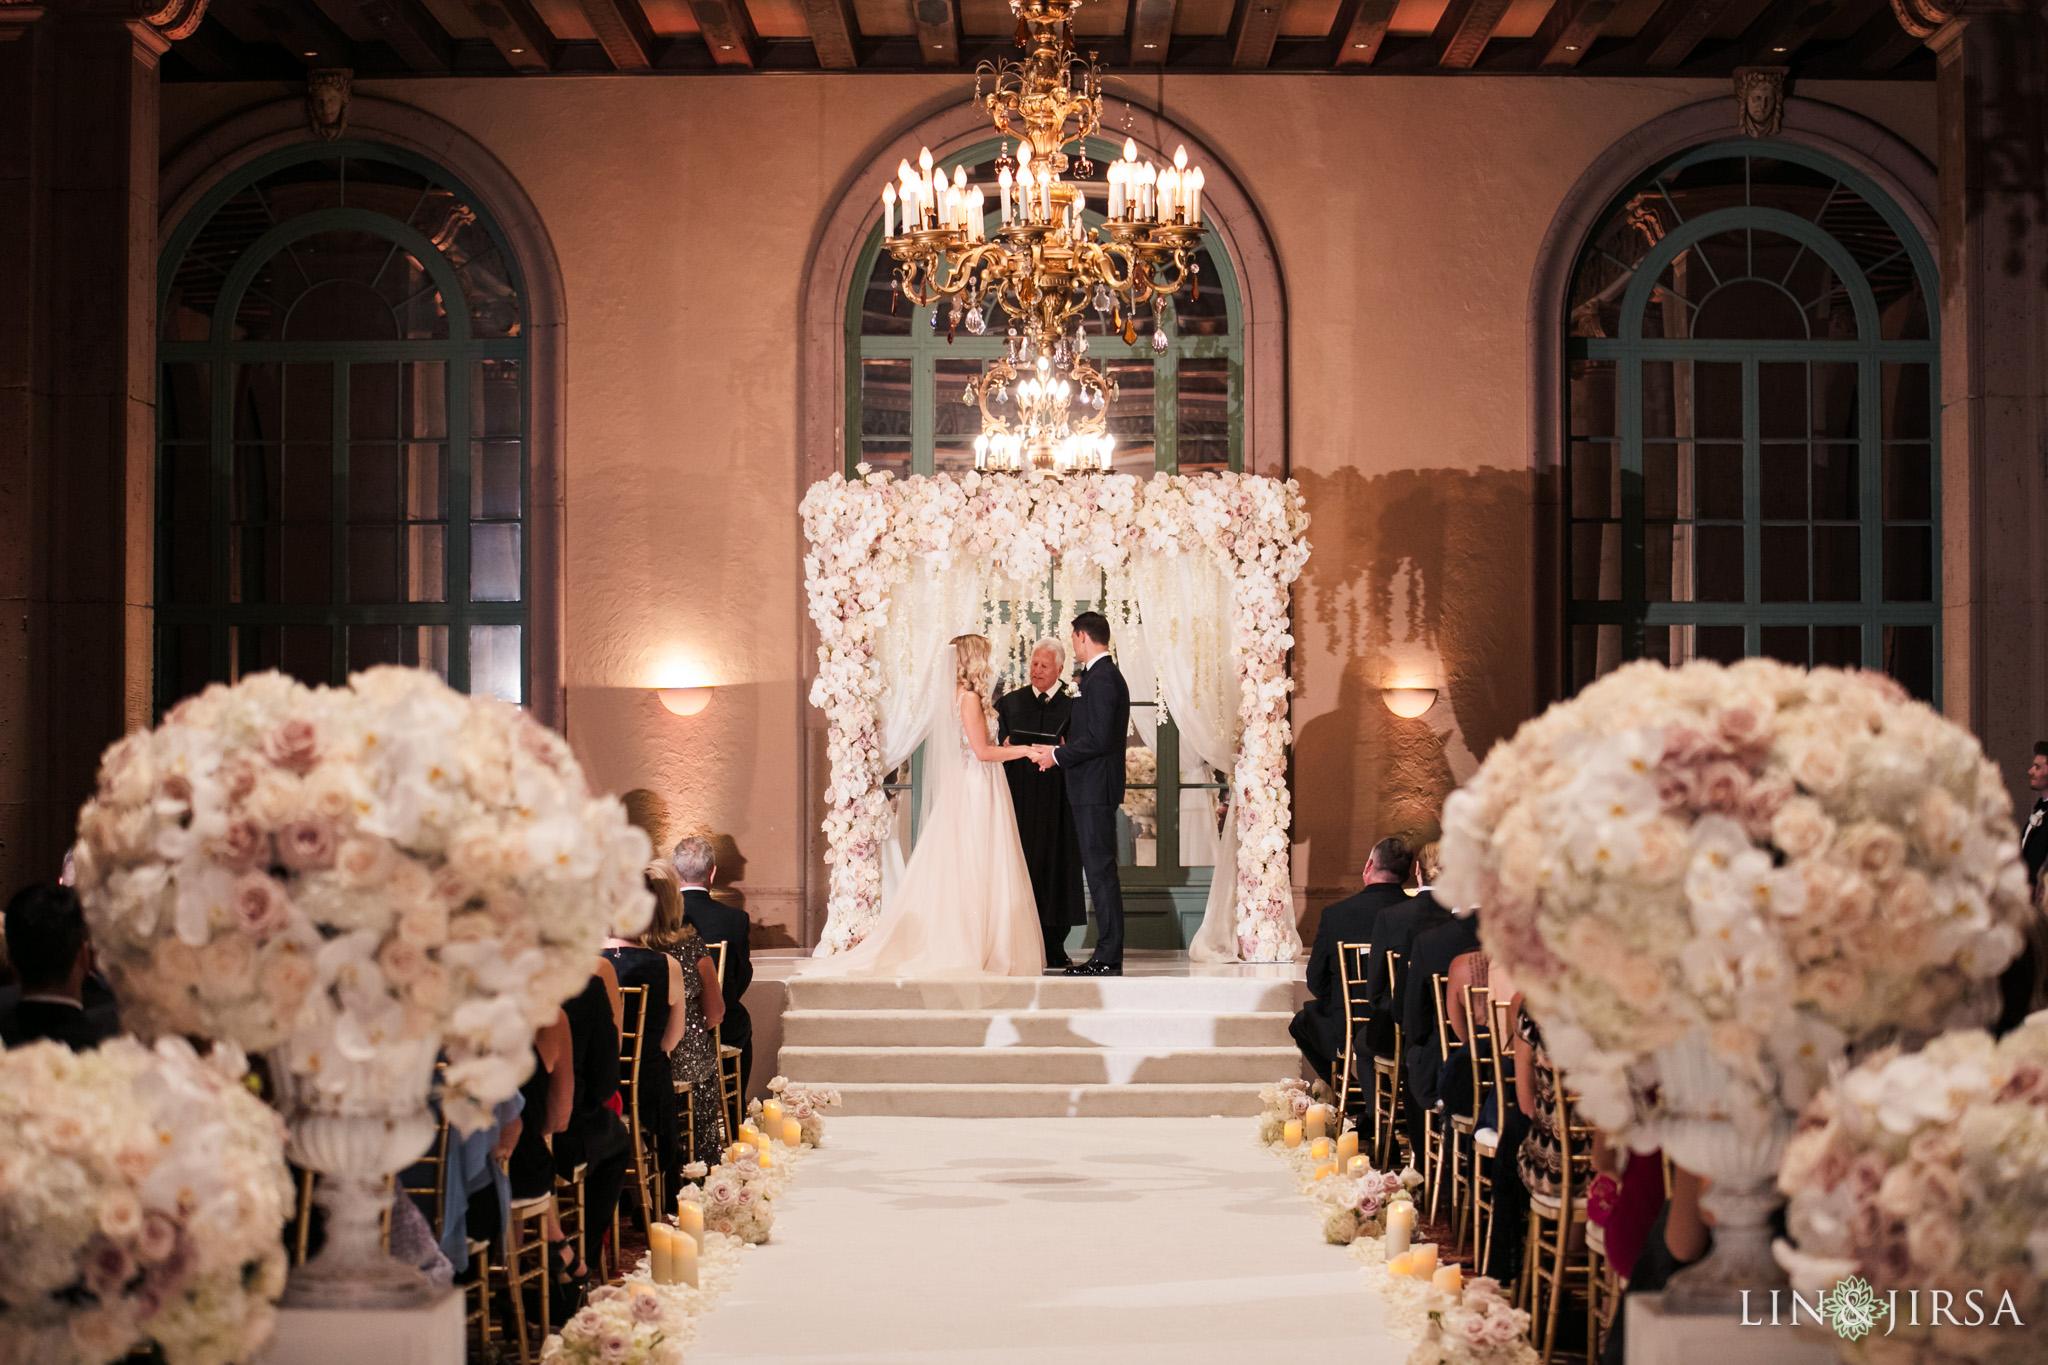 012 millennium biltmore hotel los angeles wedding photography